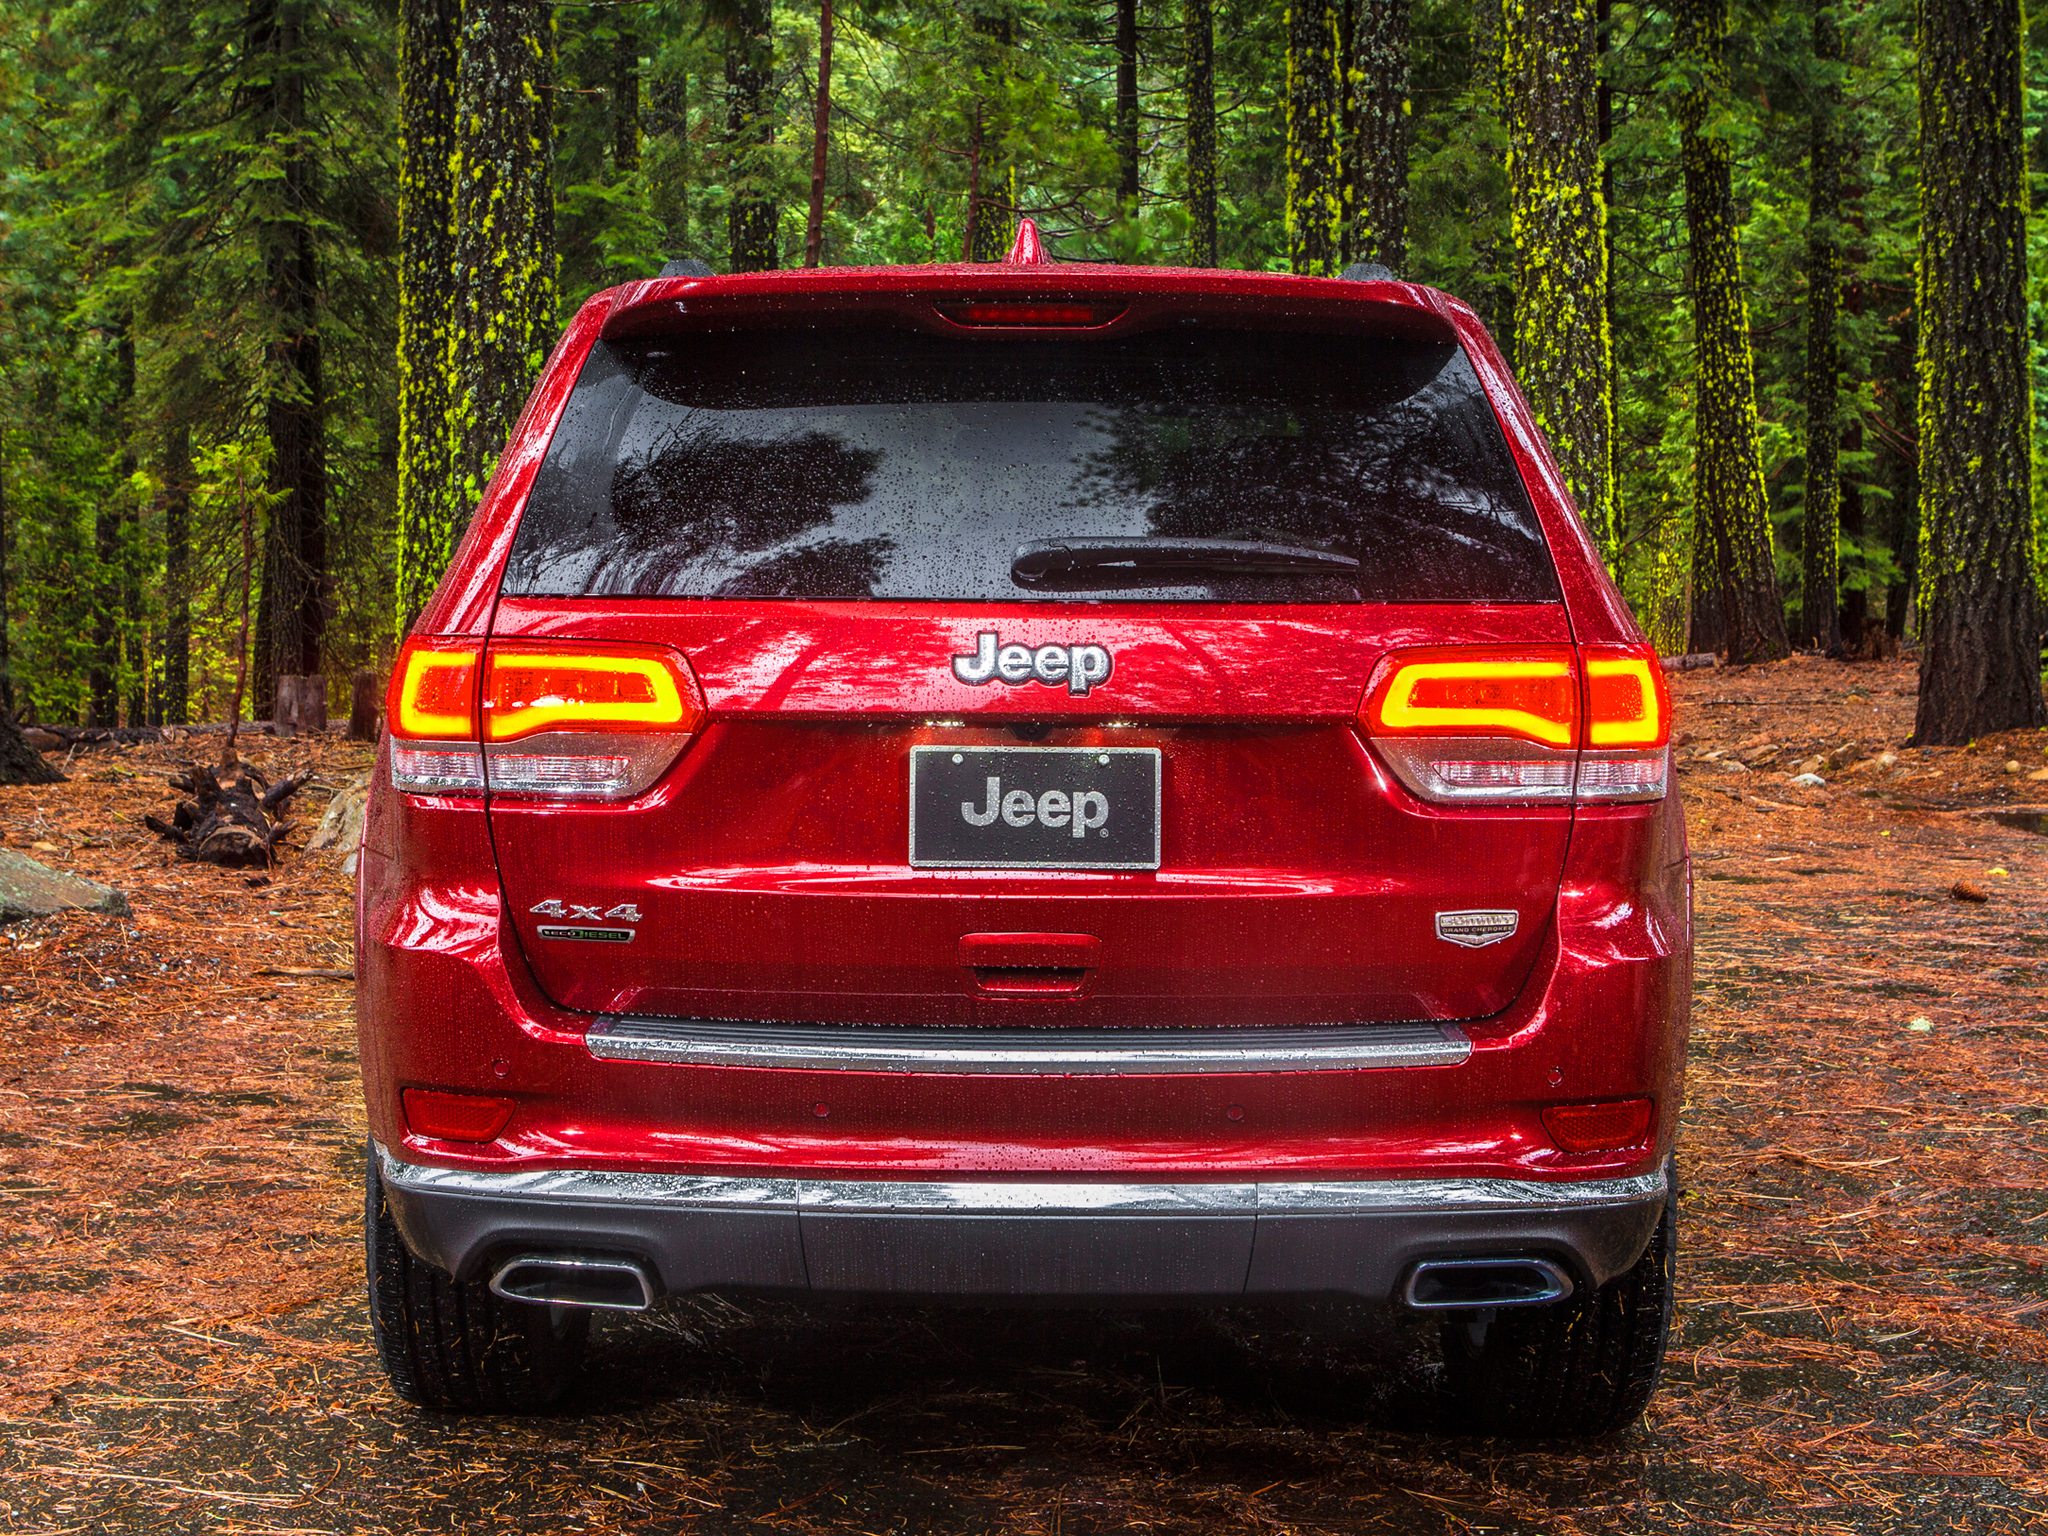 Jeep Cherokee 2018 года: фото, отзывы, цена, комплектации, характеристики